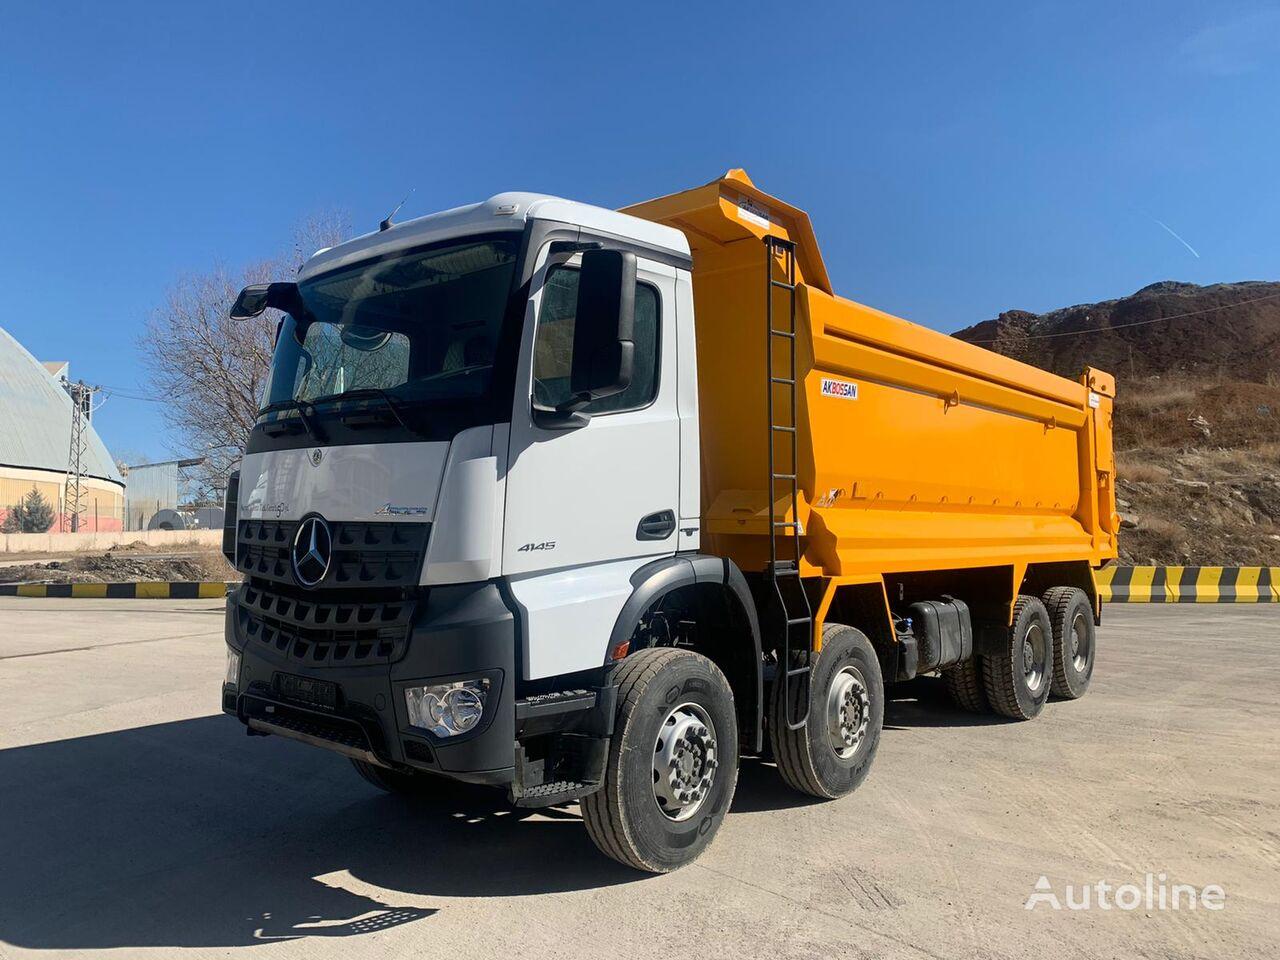 MERCEDES-BENZ AROCS 4145 dump truck